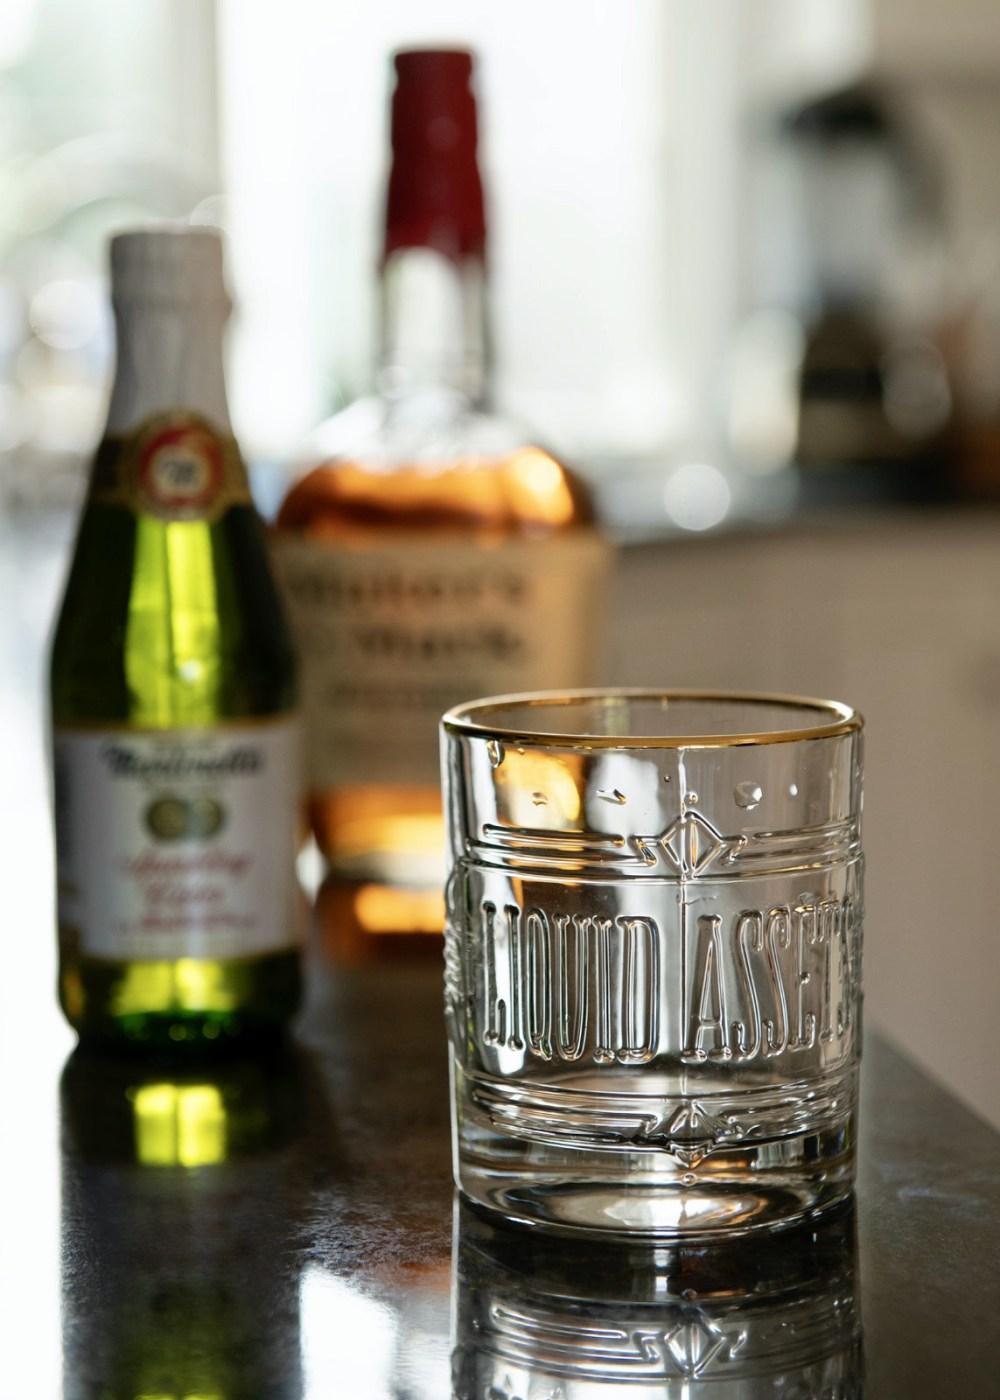 A fun glass make a cocktail taste better!